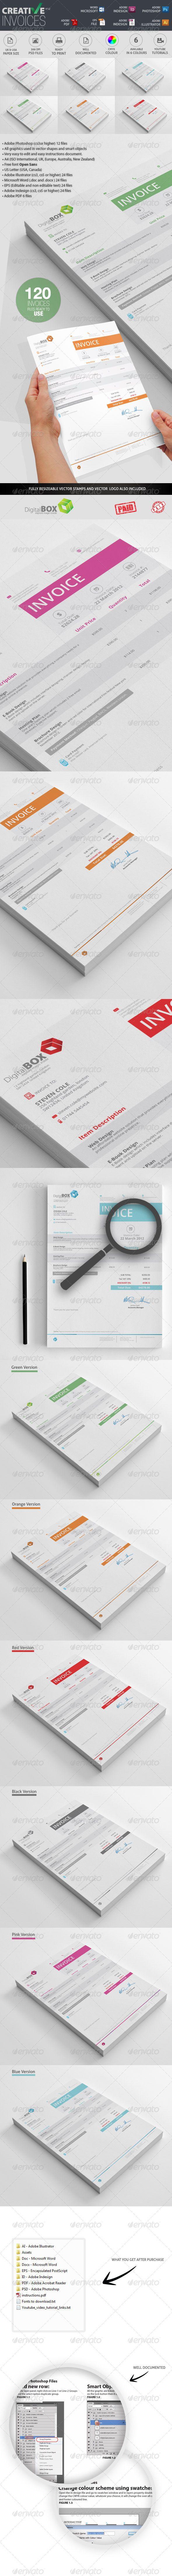 Invoice Page Custom 22 Best Invoice Design  Invoice Template  Invoice In Graphics .